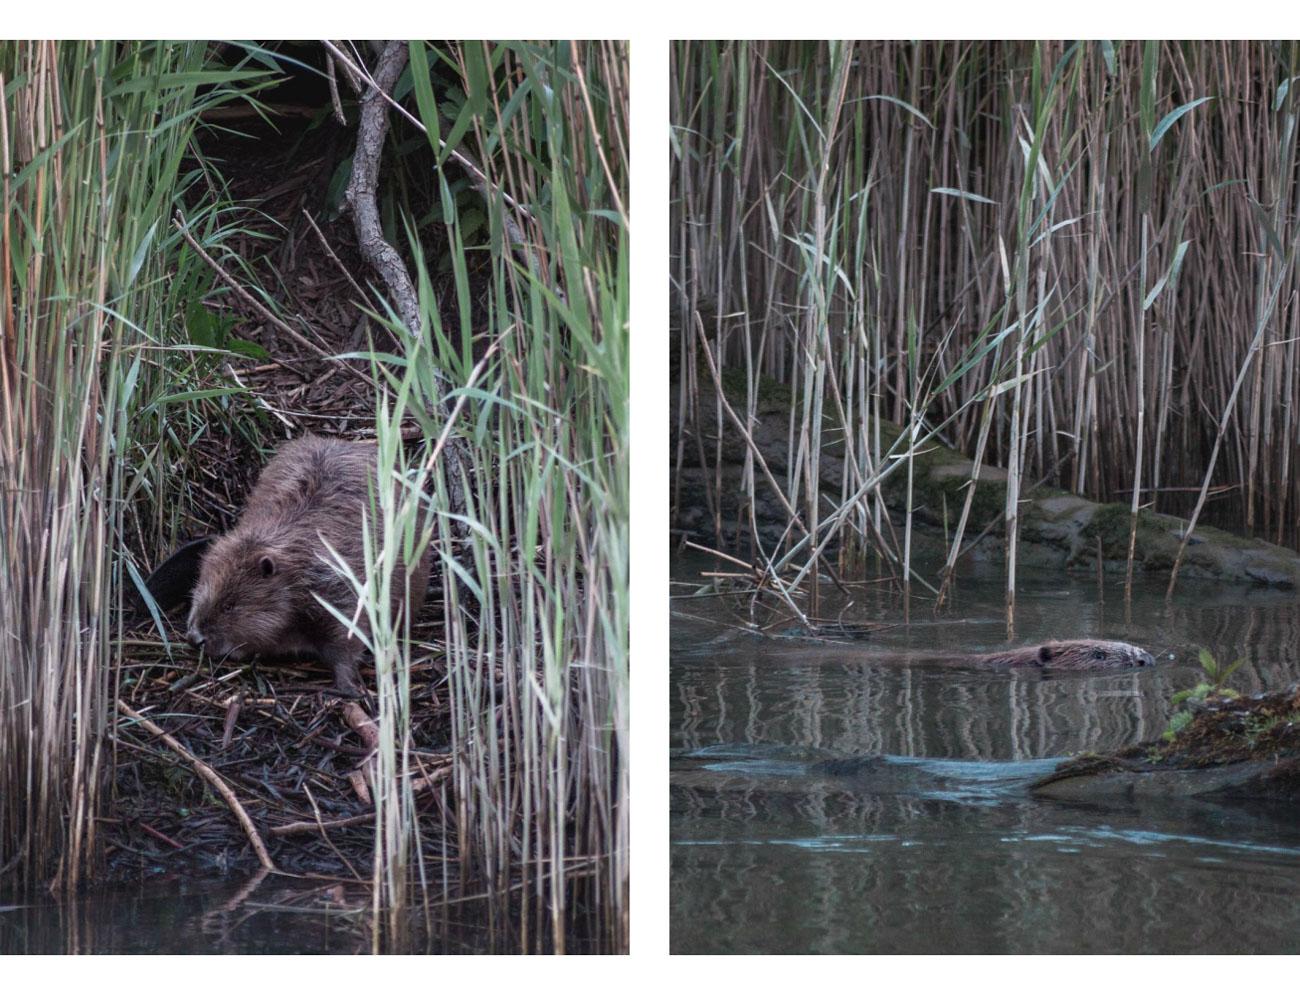 bobry safari park narodowy biesbosch holandia